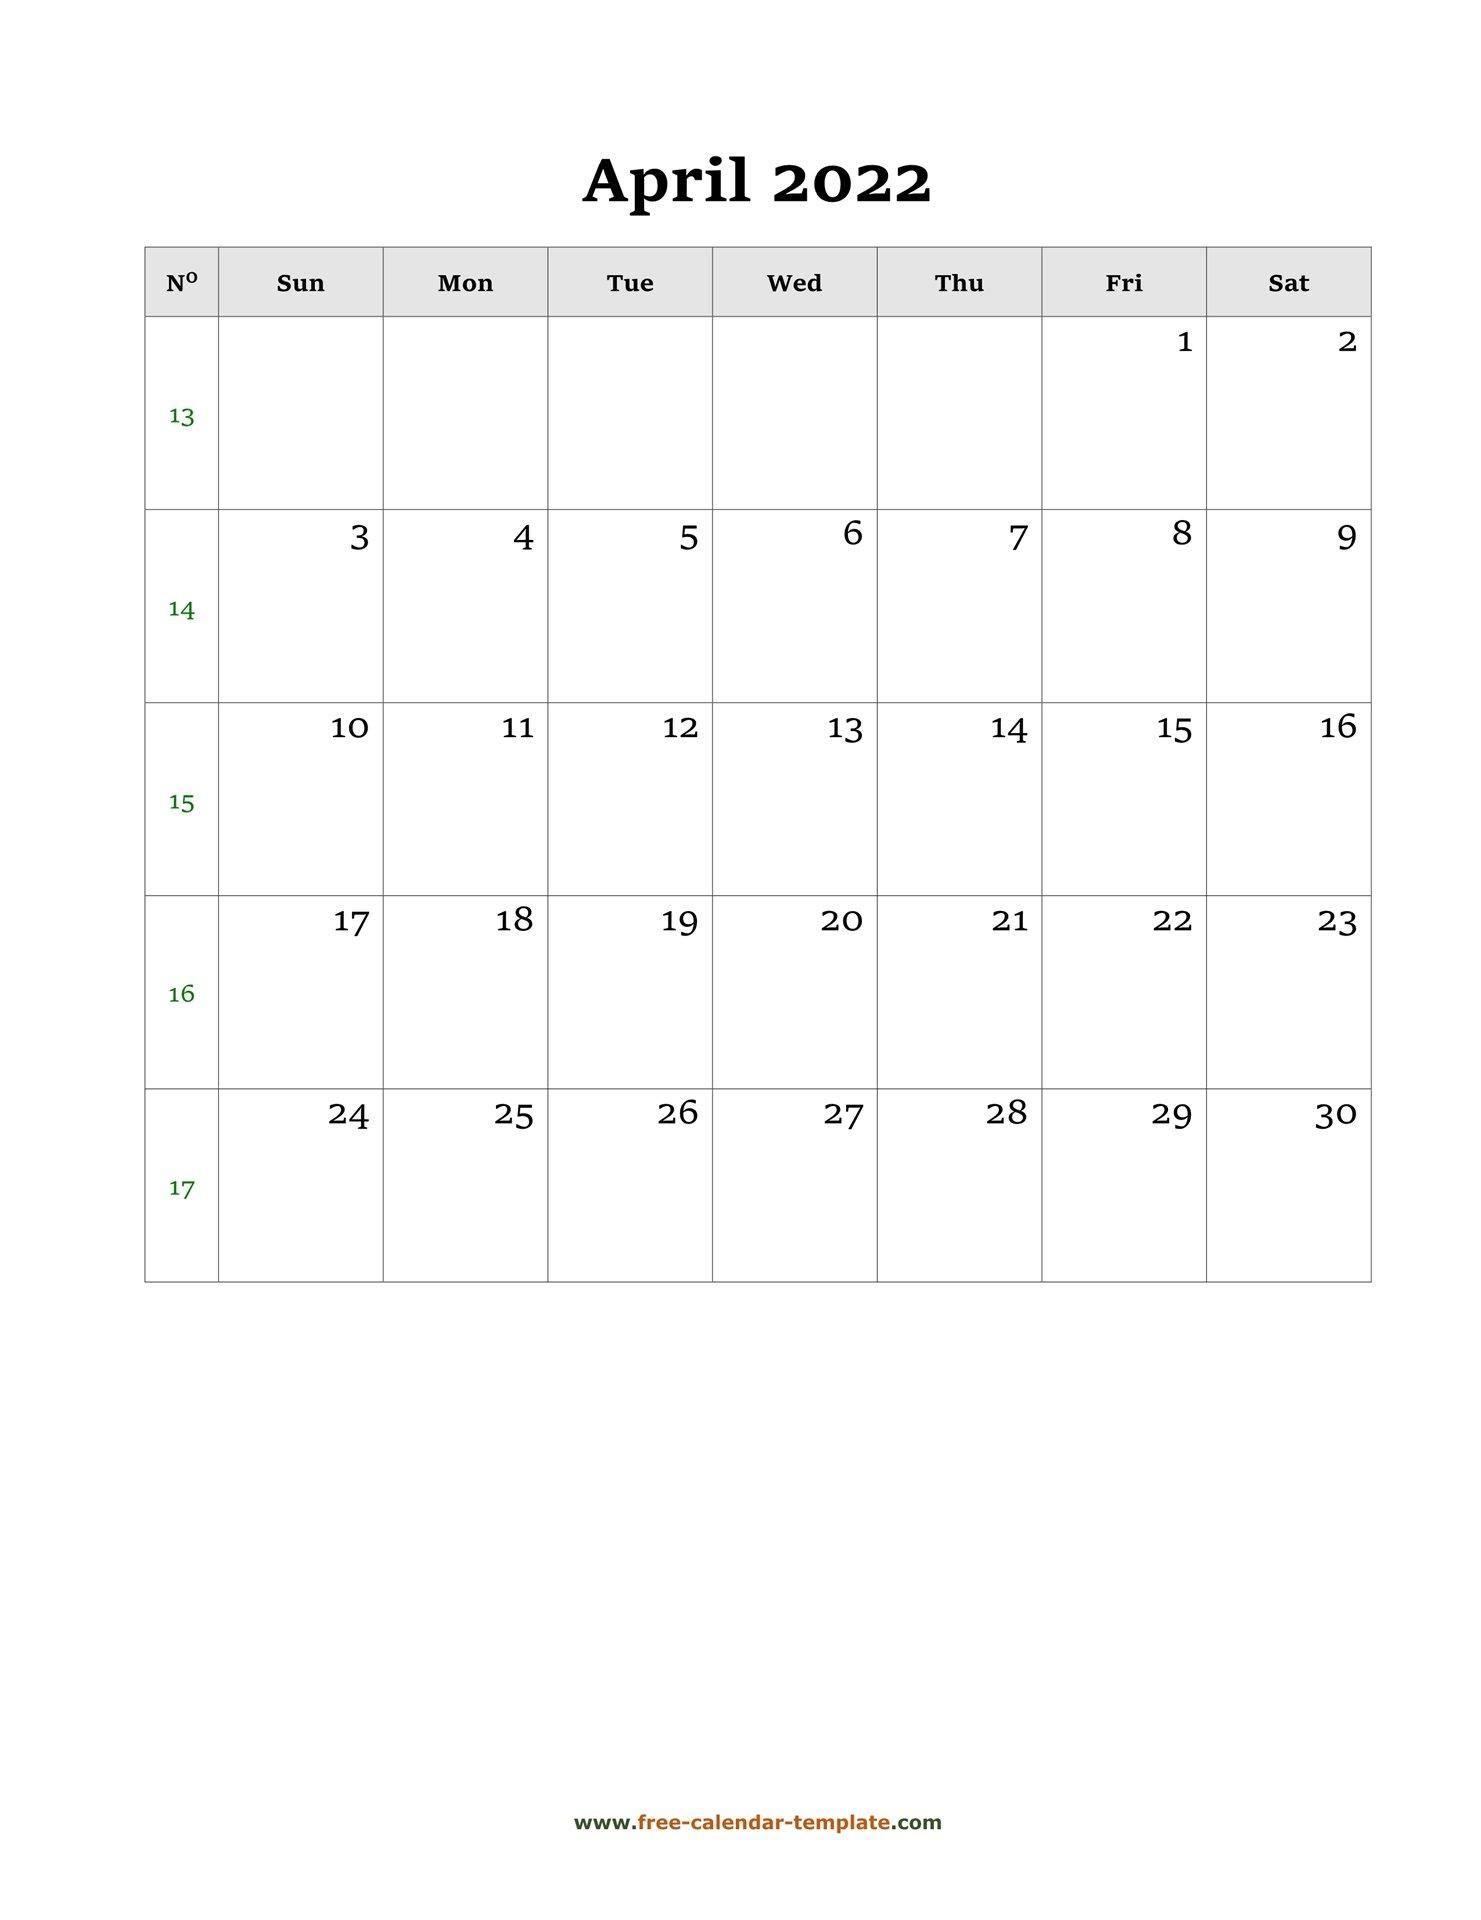 April Calendar 2022 Simple Design With Large Box On Each inside April 2022 Printable Calendar Free 2022 Graphics